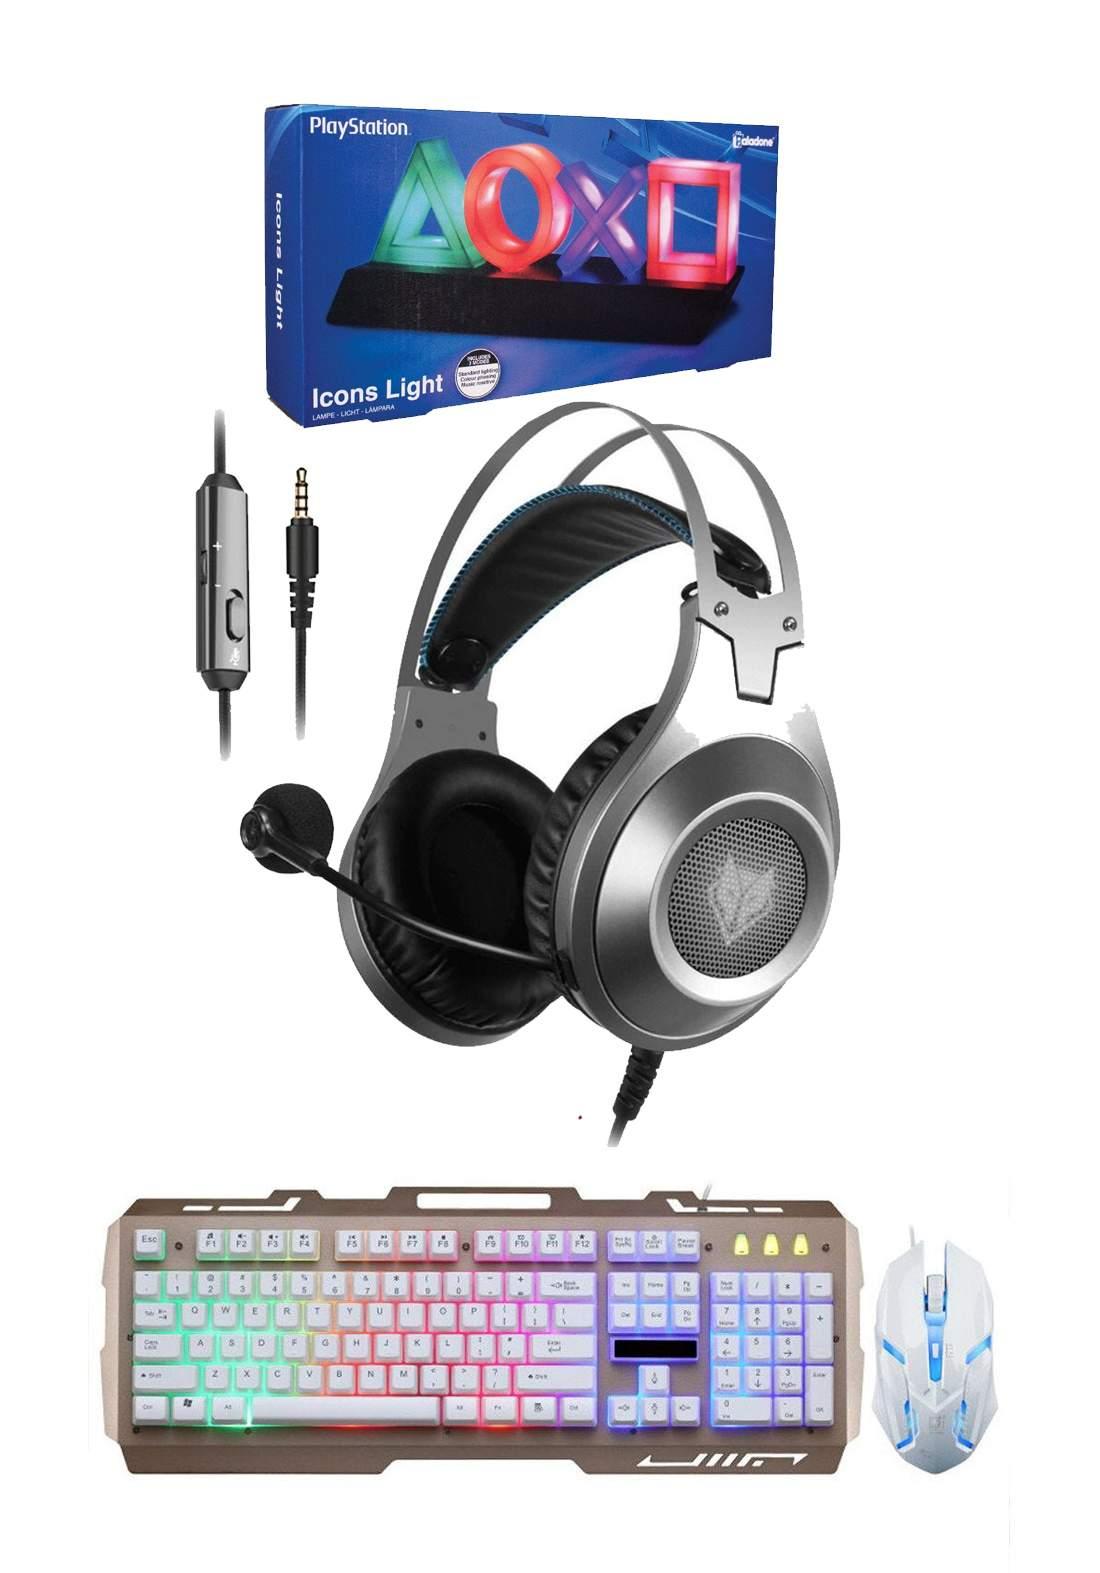 Set of  NUBWO  N2 Gaming Headphones &  Playstation Icons Light & G700 Gaming Keyboard and Mouse  بكج من سماعة وكيبورد وماوس وايقونات بلاستيشن